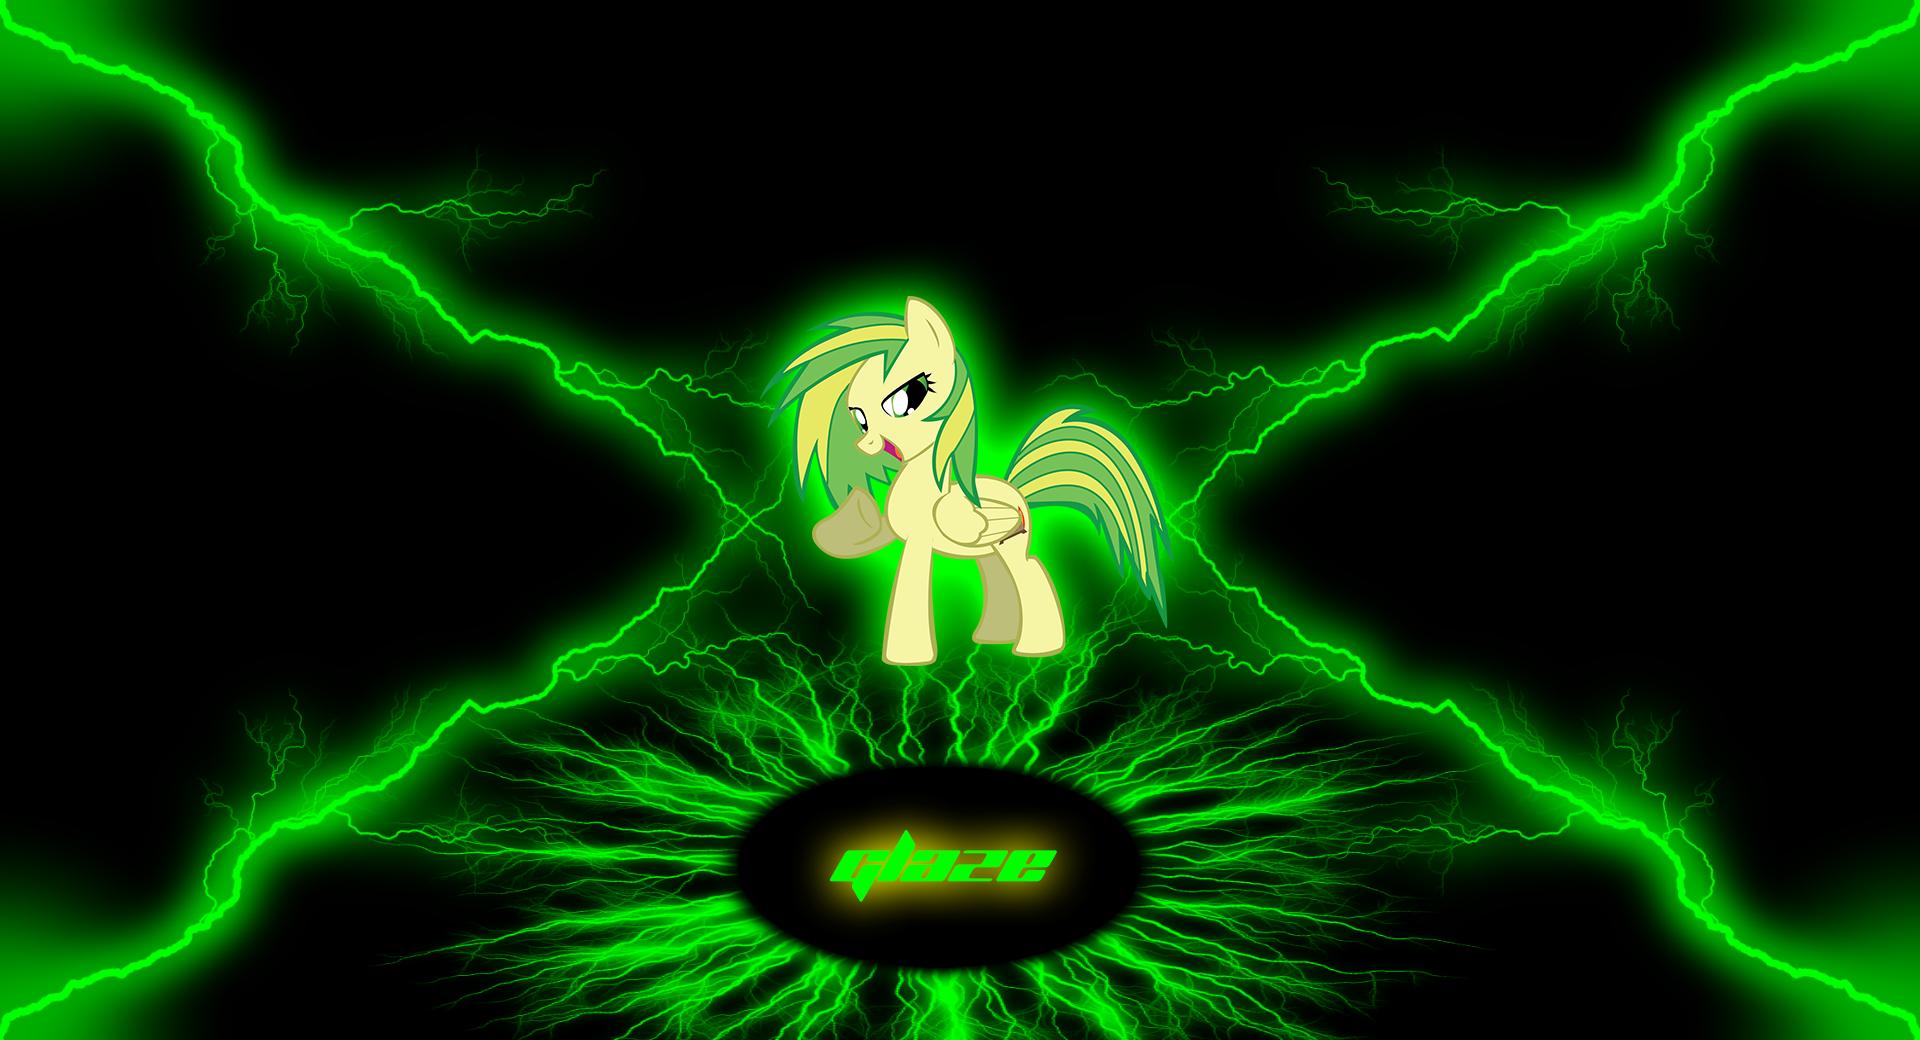 "Glaze ""Lightning Glow"" wallpaper by Baron-Kettell and DjDa5h"